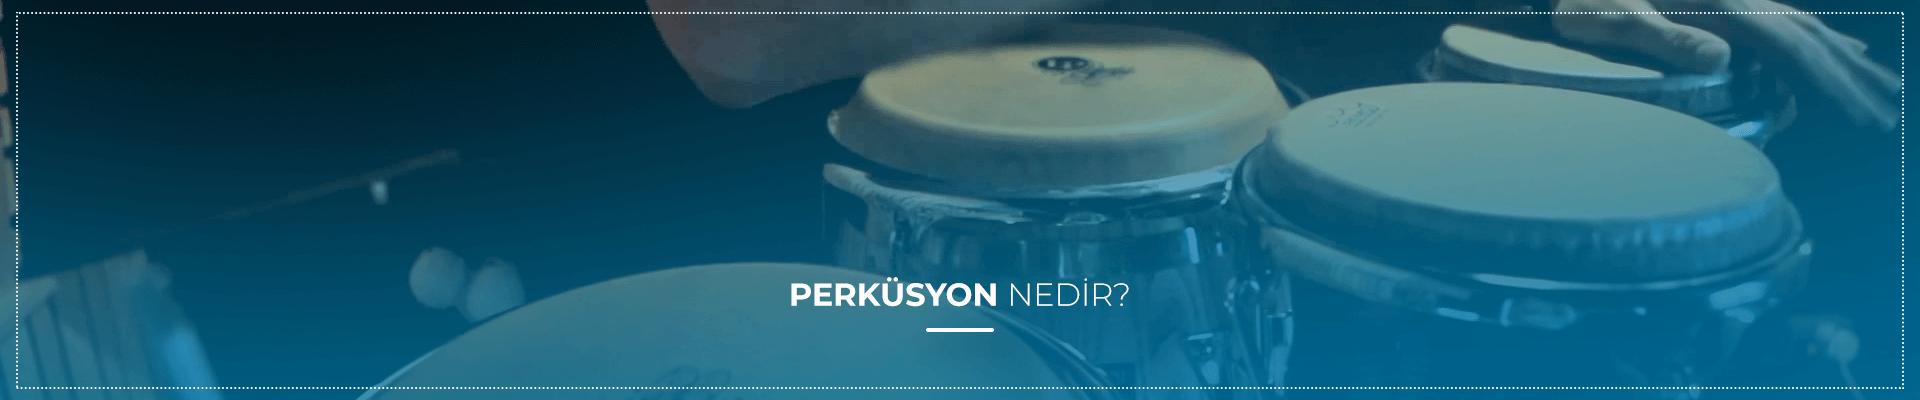 perkusyon-nedir